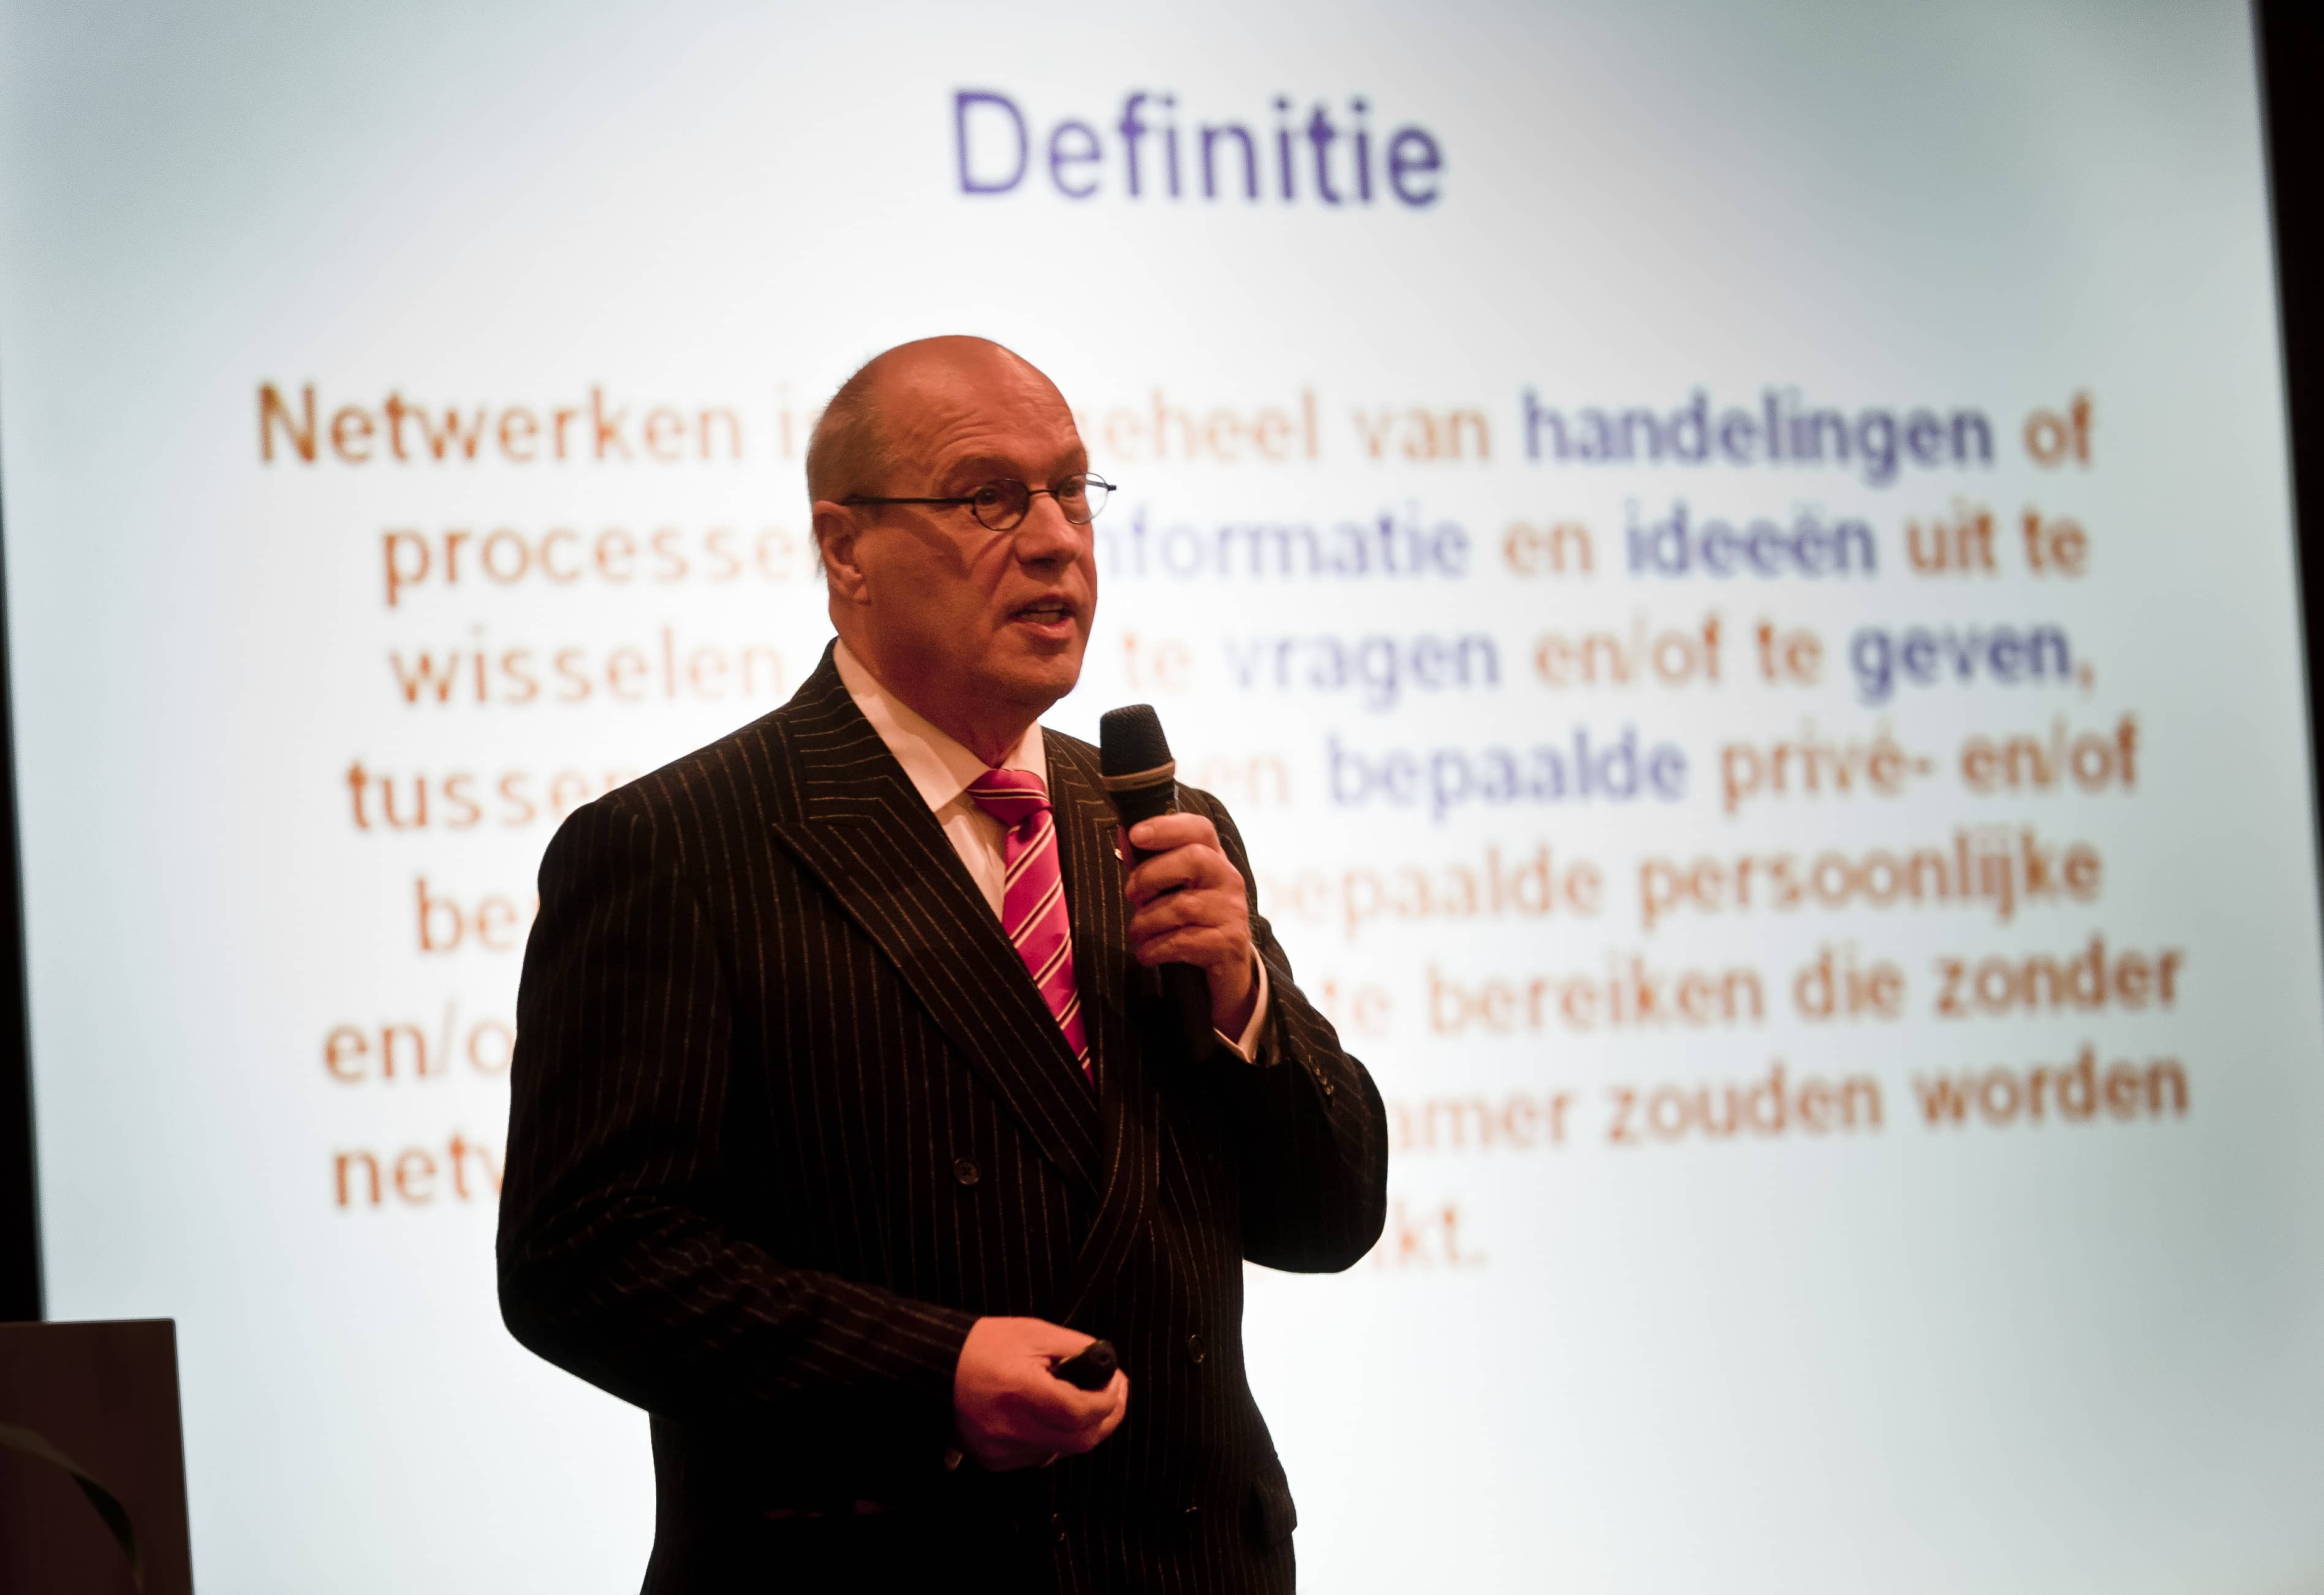 Phil Kleingeld